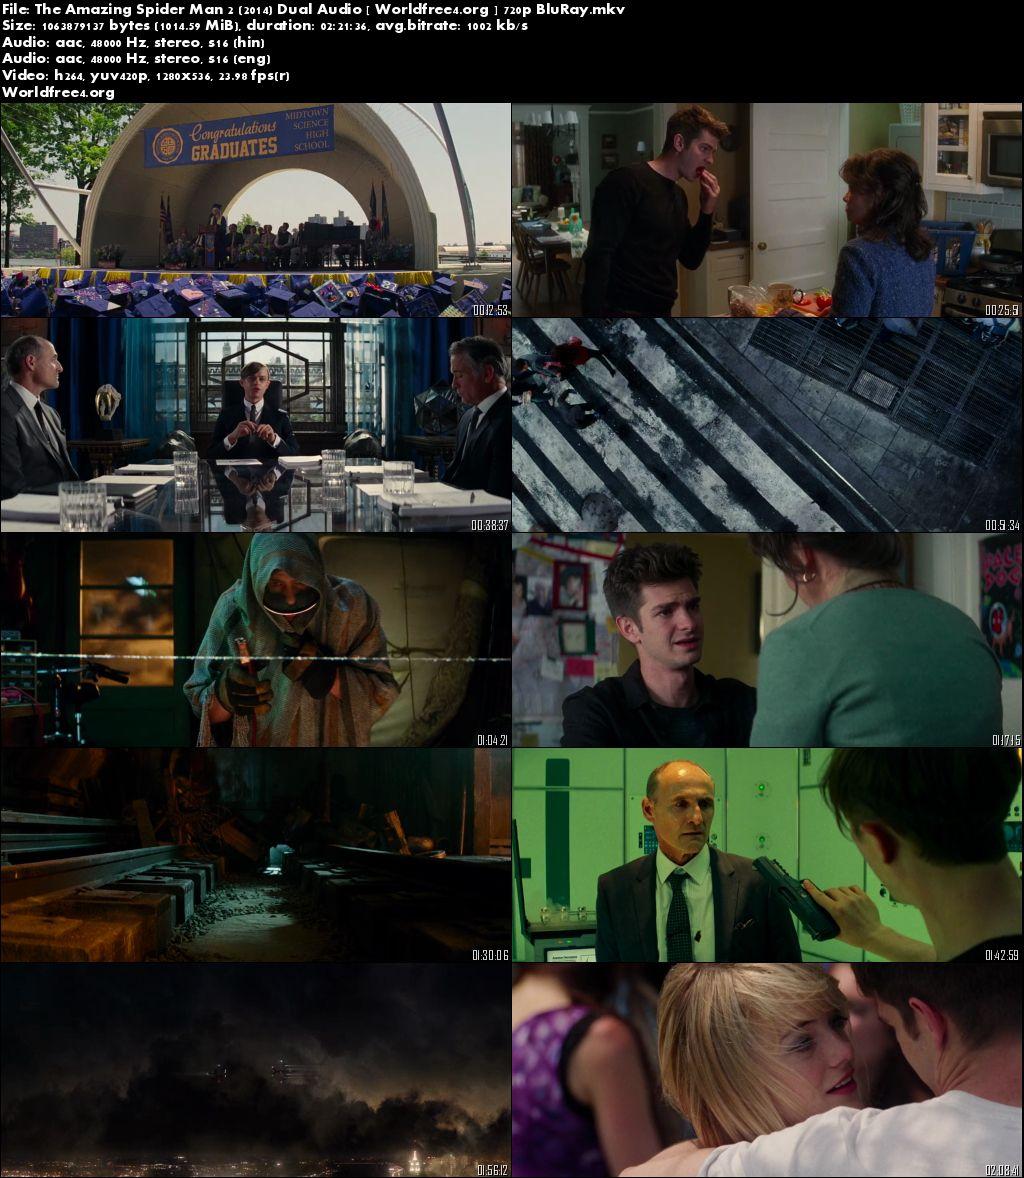 The Amazing Spider Man 2 (2014) BluRay Download Dual Audio 720p